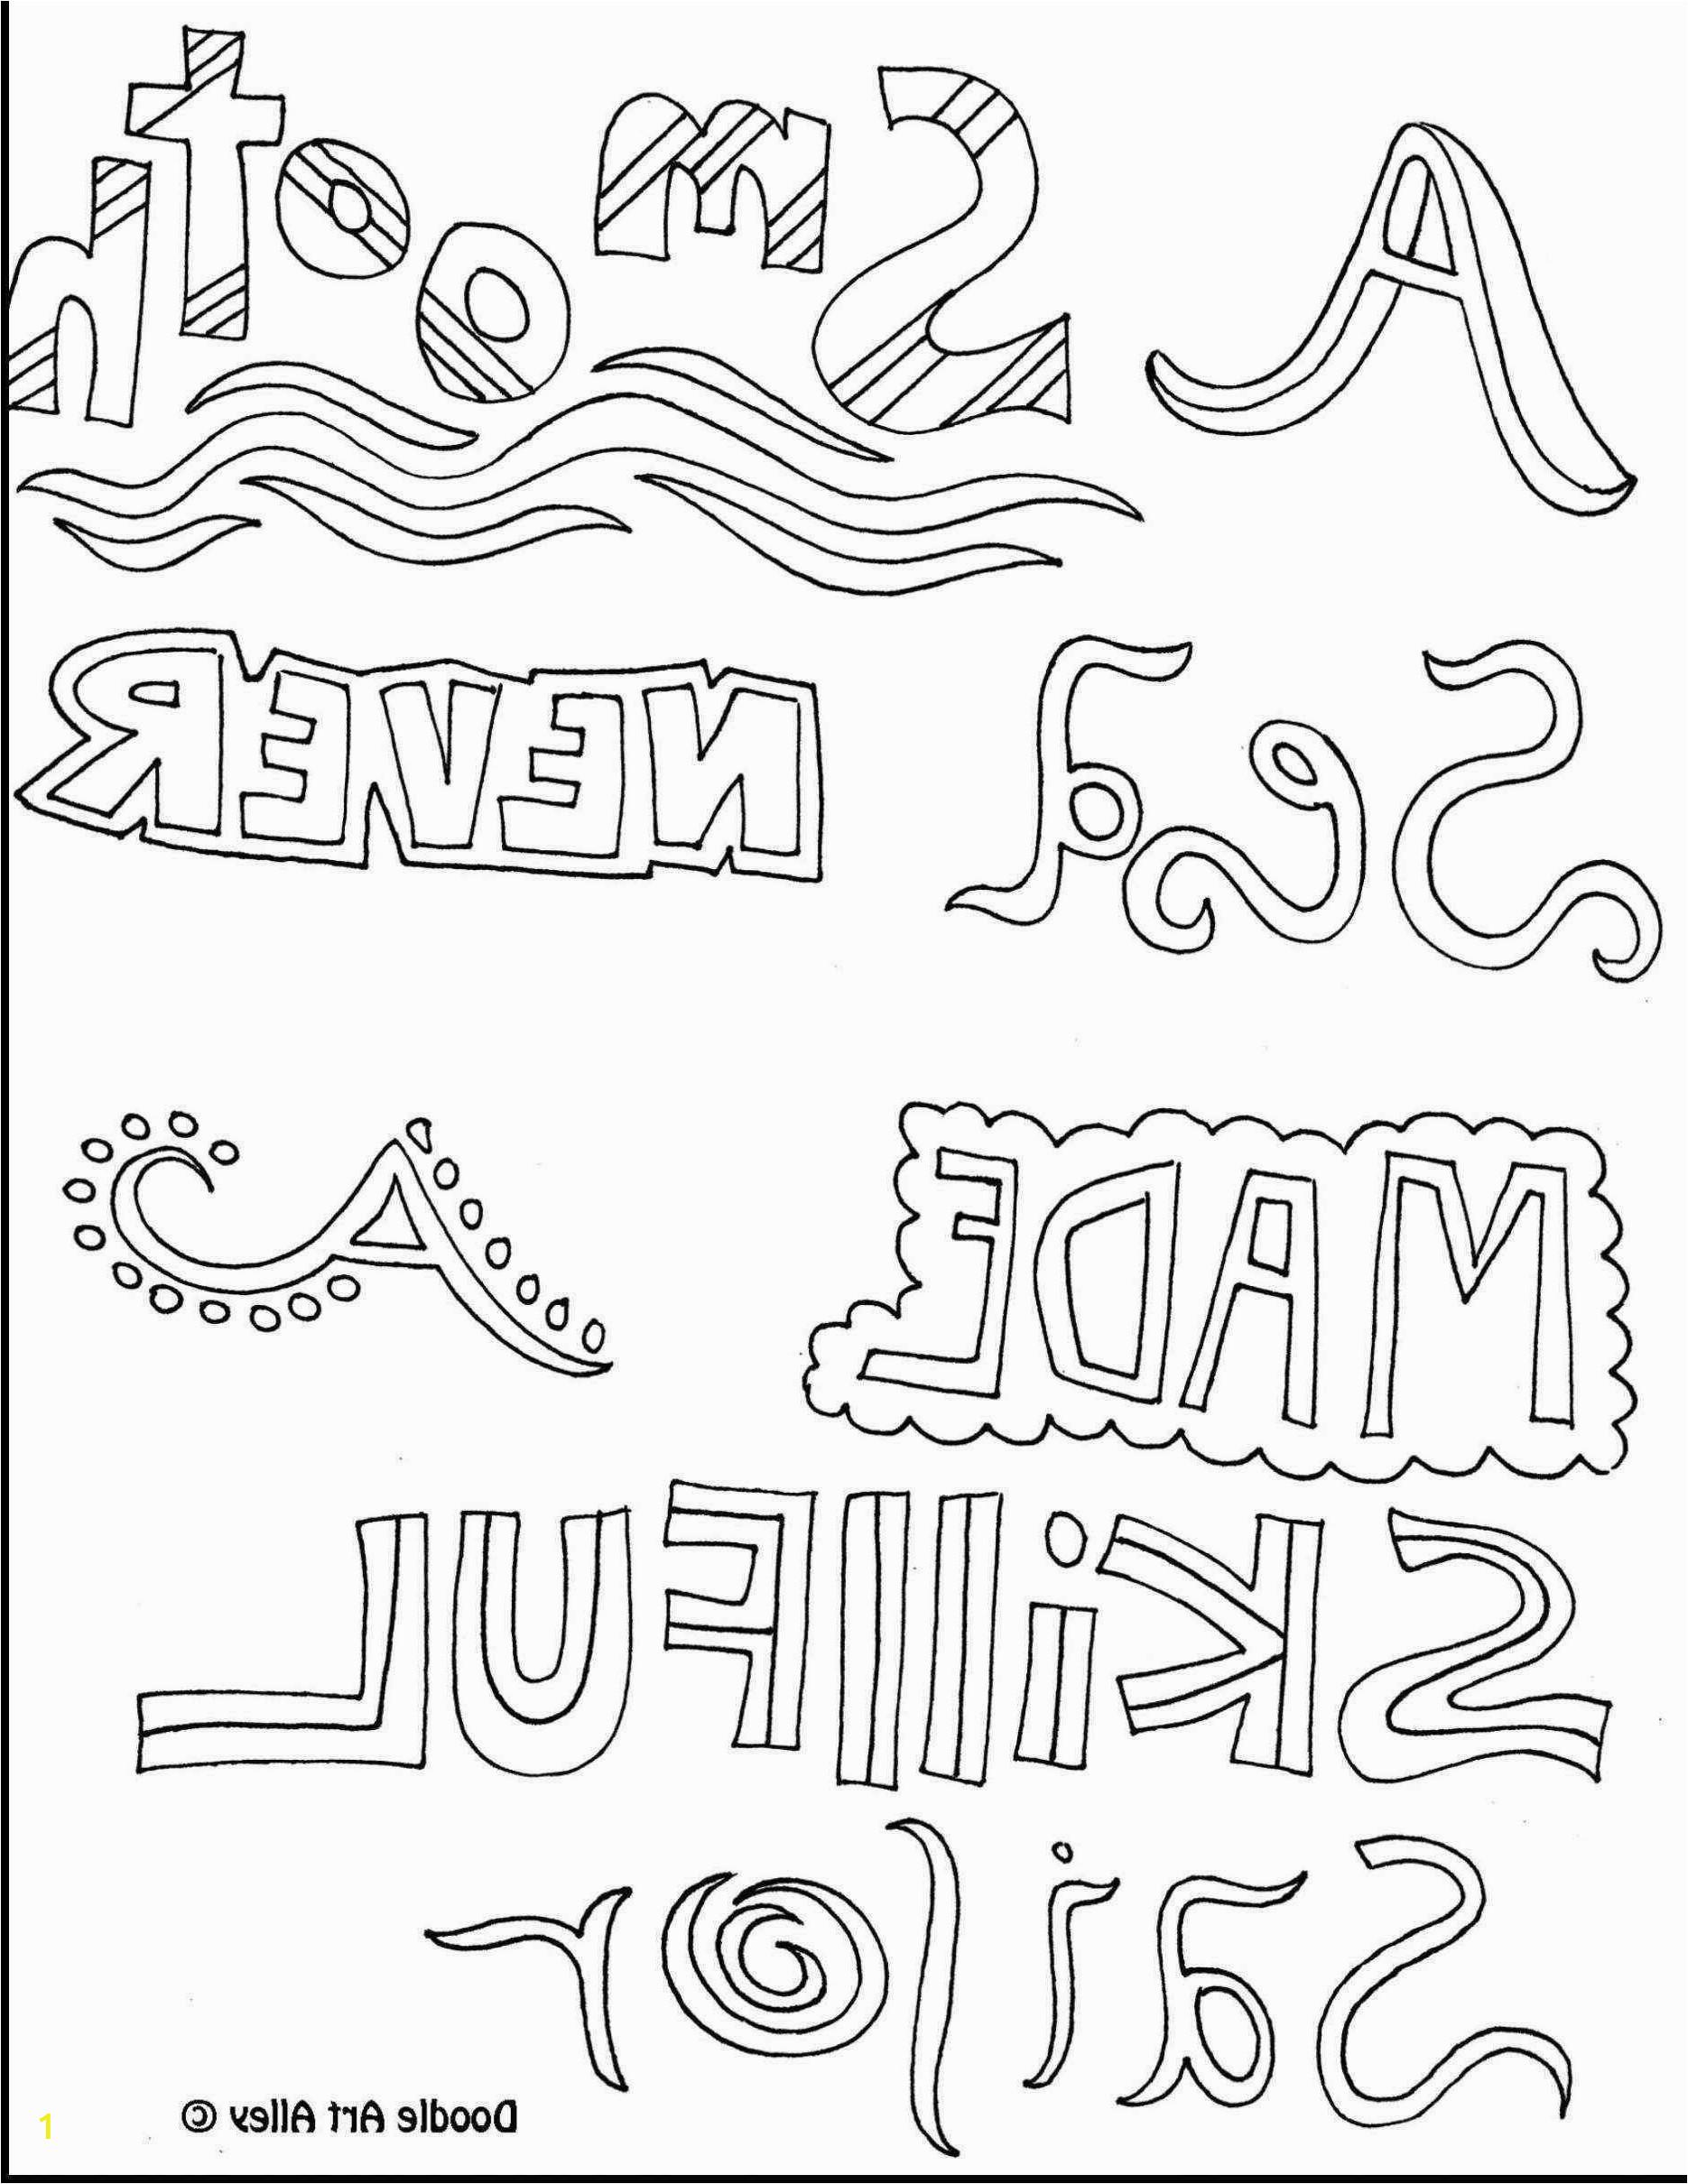 polar express coloring sheet elegant collection fresh gingerbread man shrek coloring pages fym of polar express coloring sheet